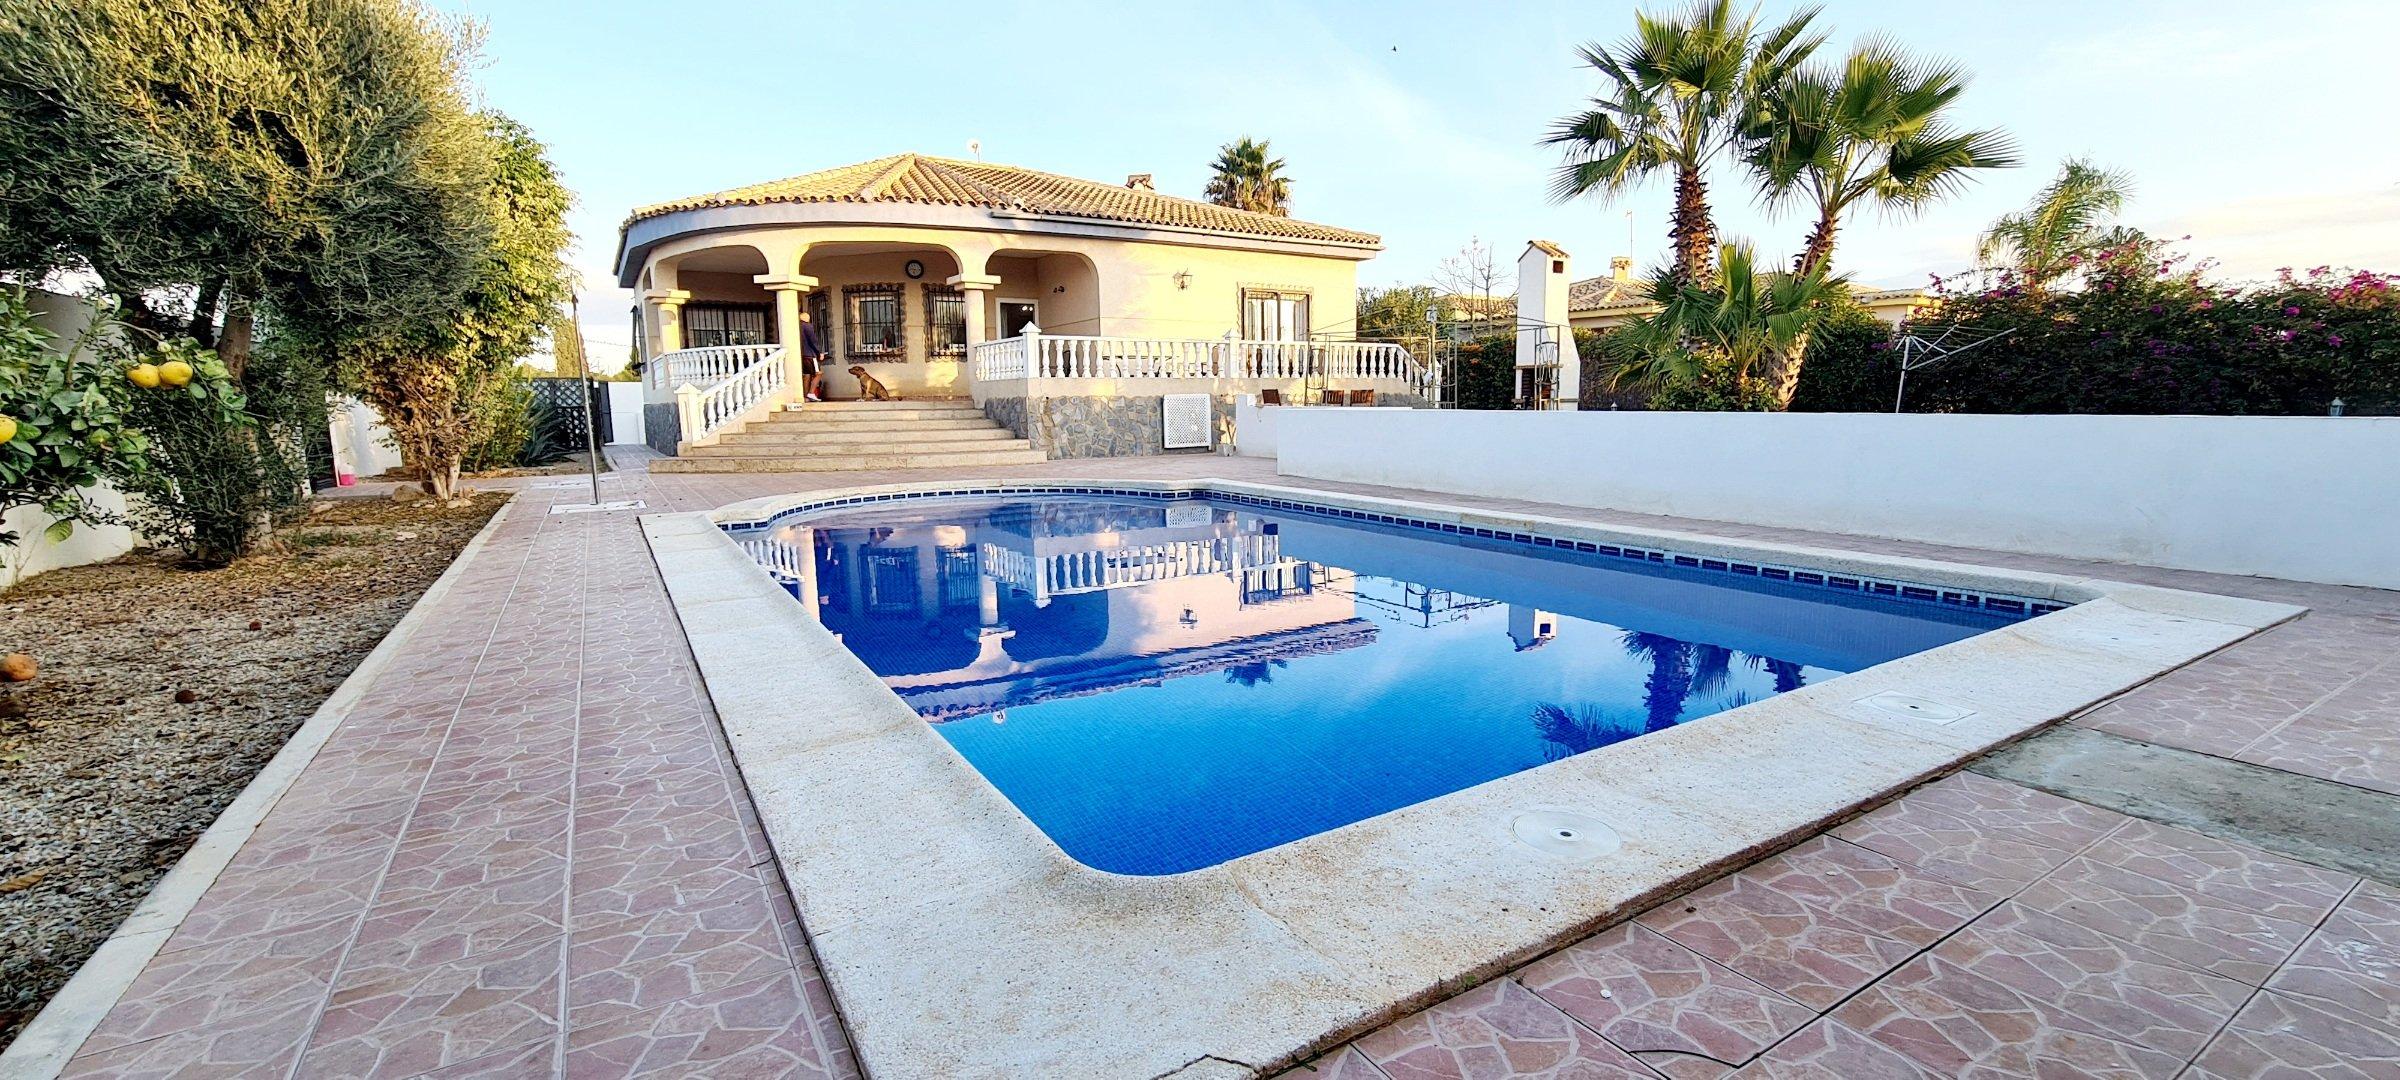 3 Bed 2 Bath Detached Villa with Private pool – Valle Del Sol – Murcia